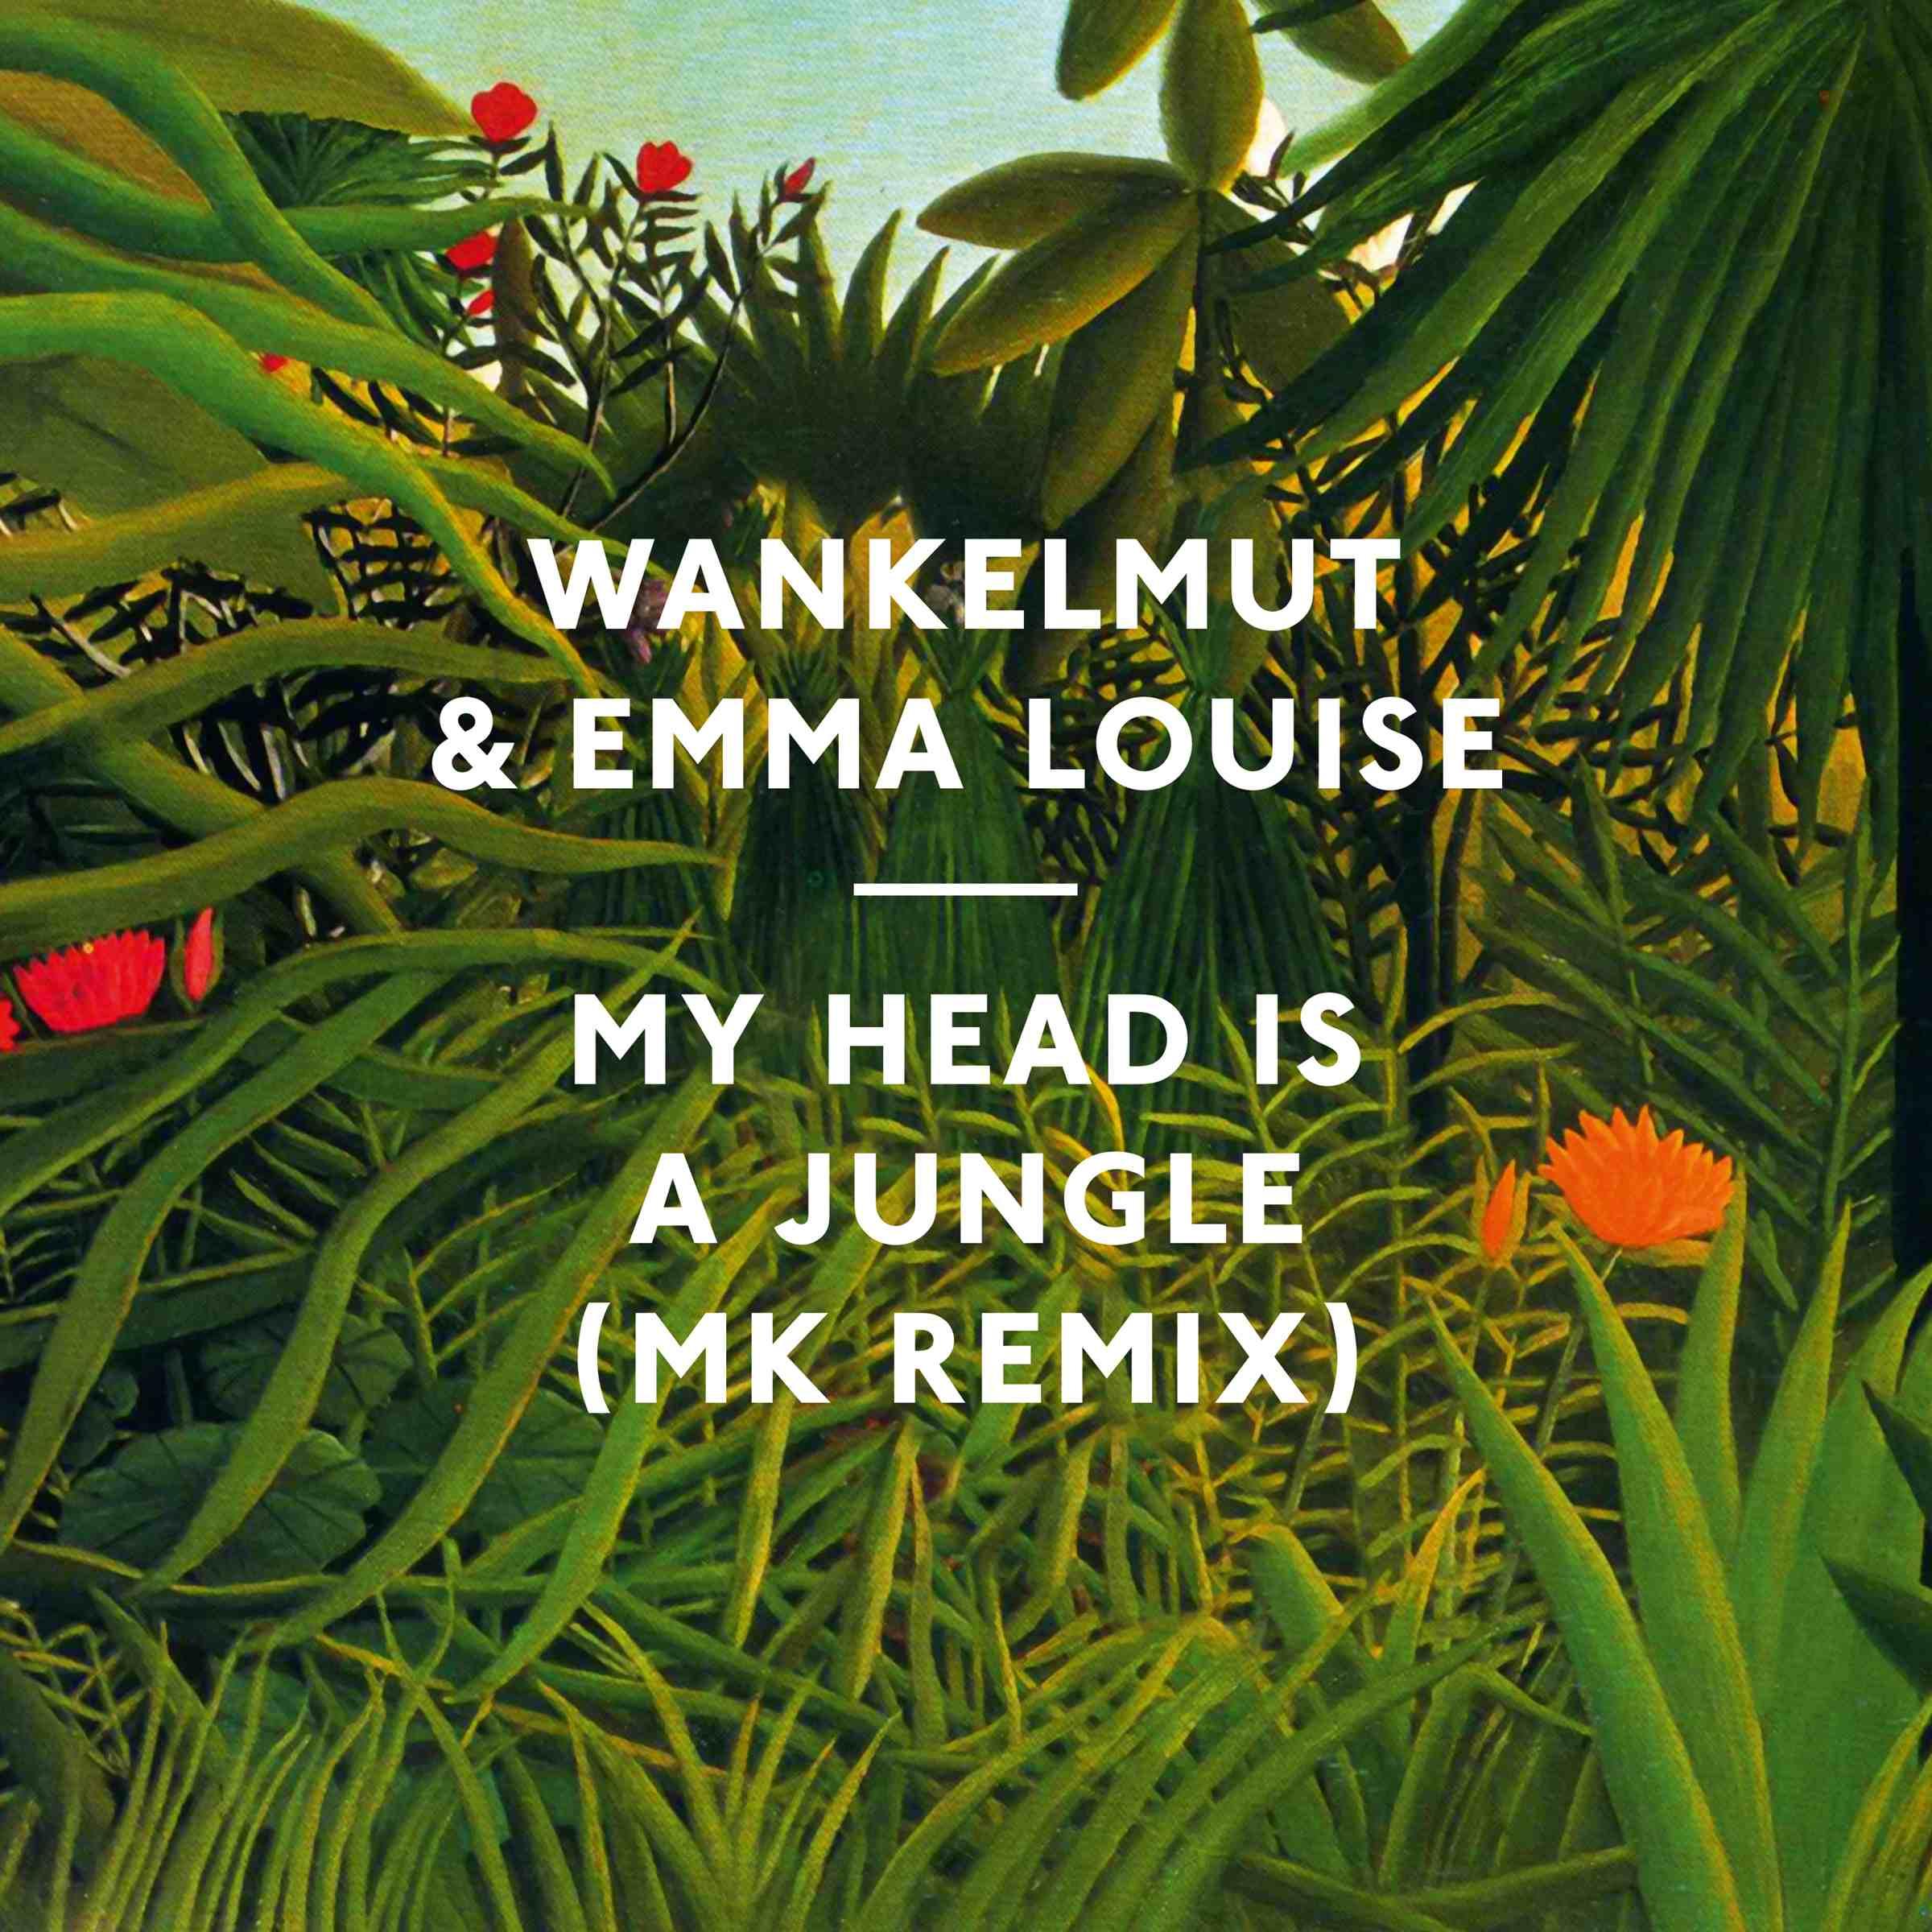 Wankelmut & Emma Louise – 'My Head Is A Jungle (MK Remix)'